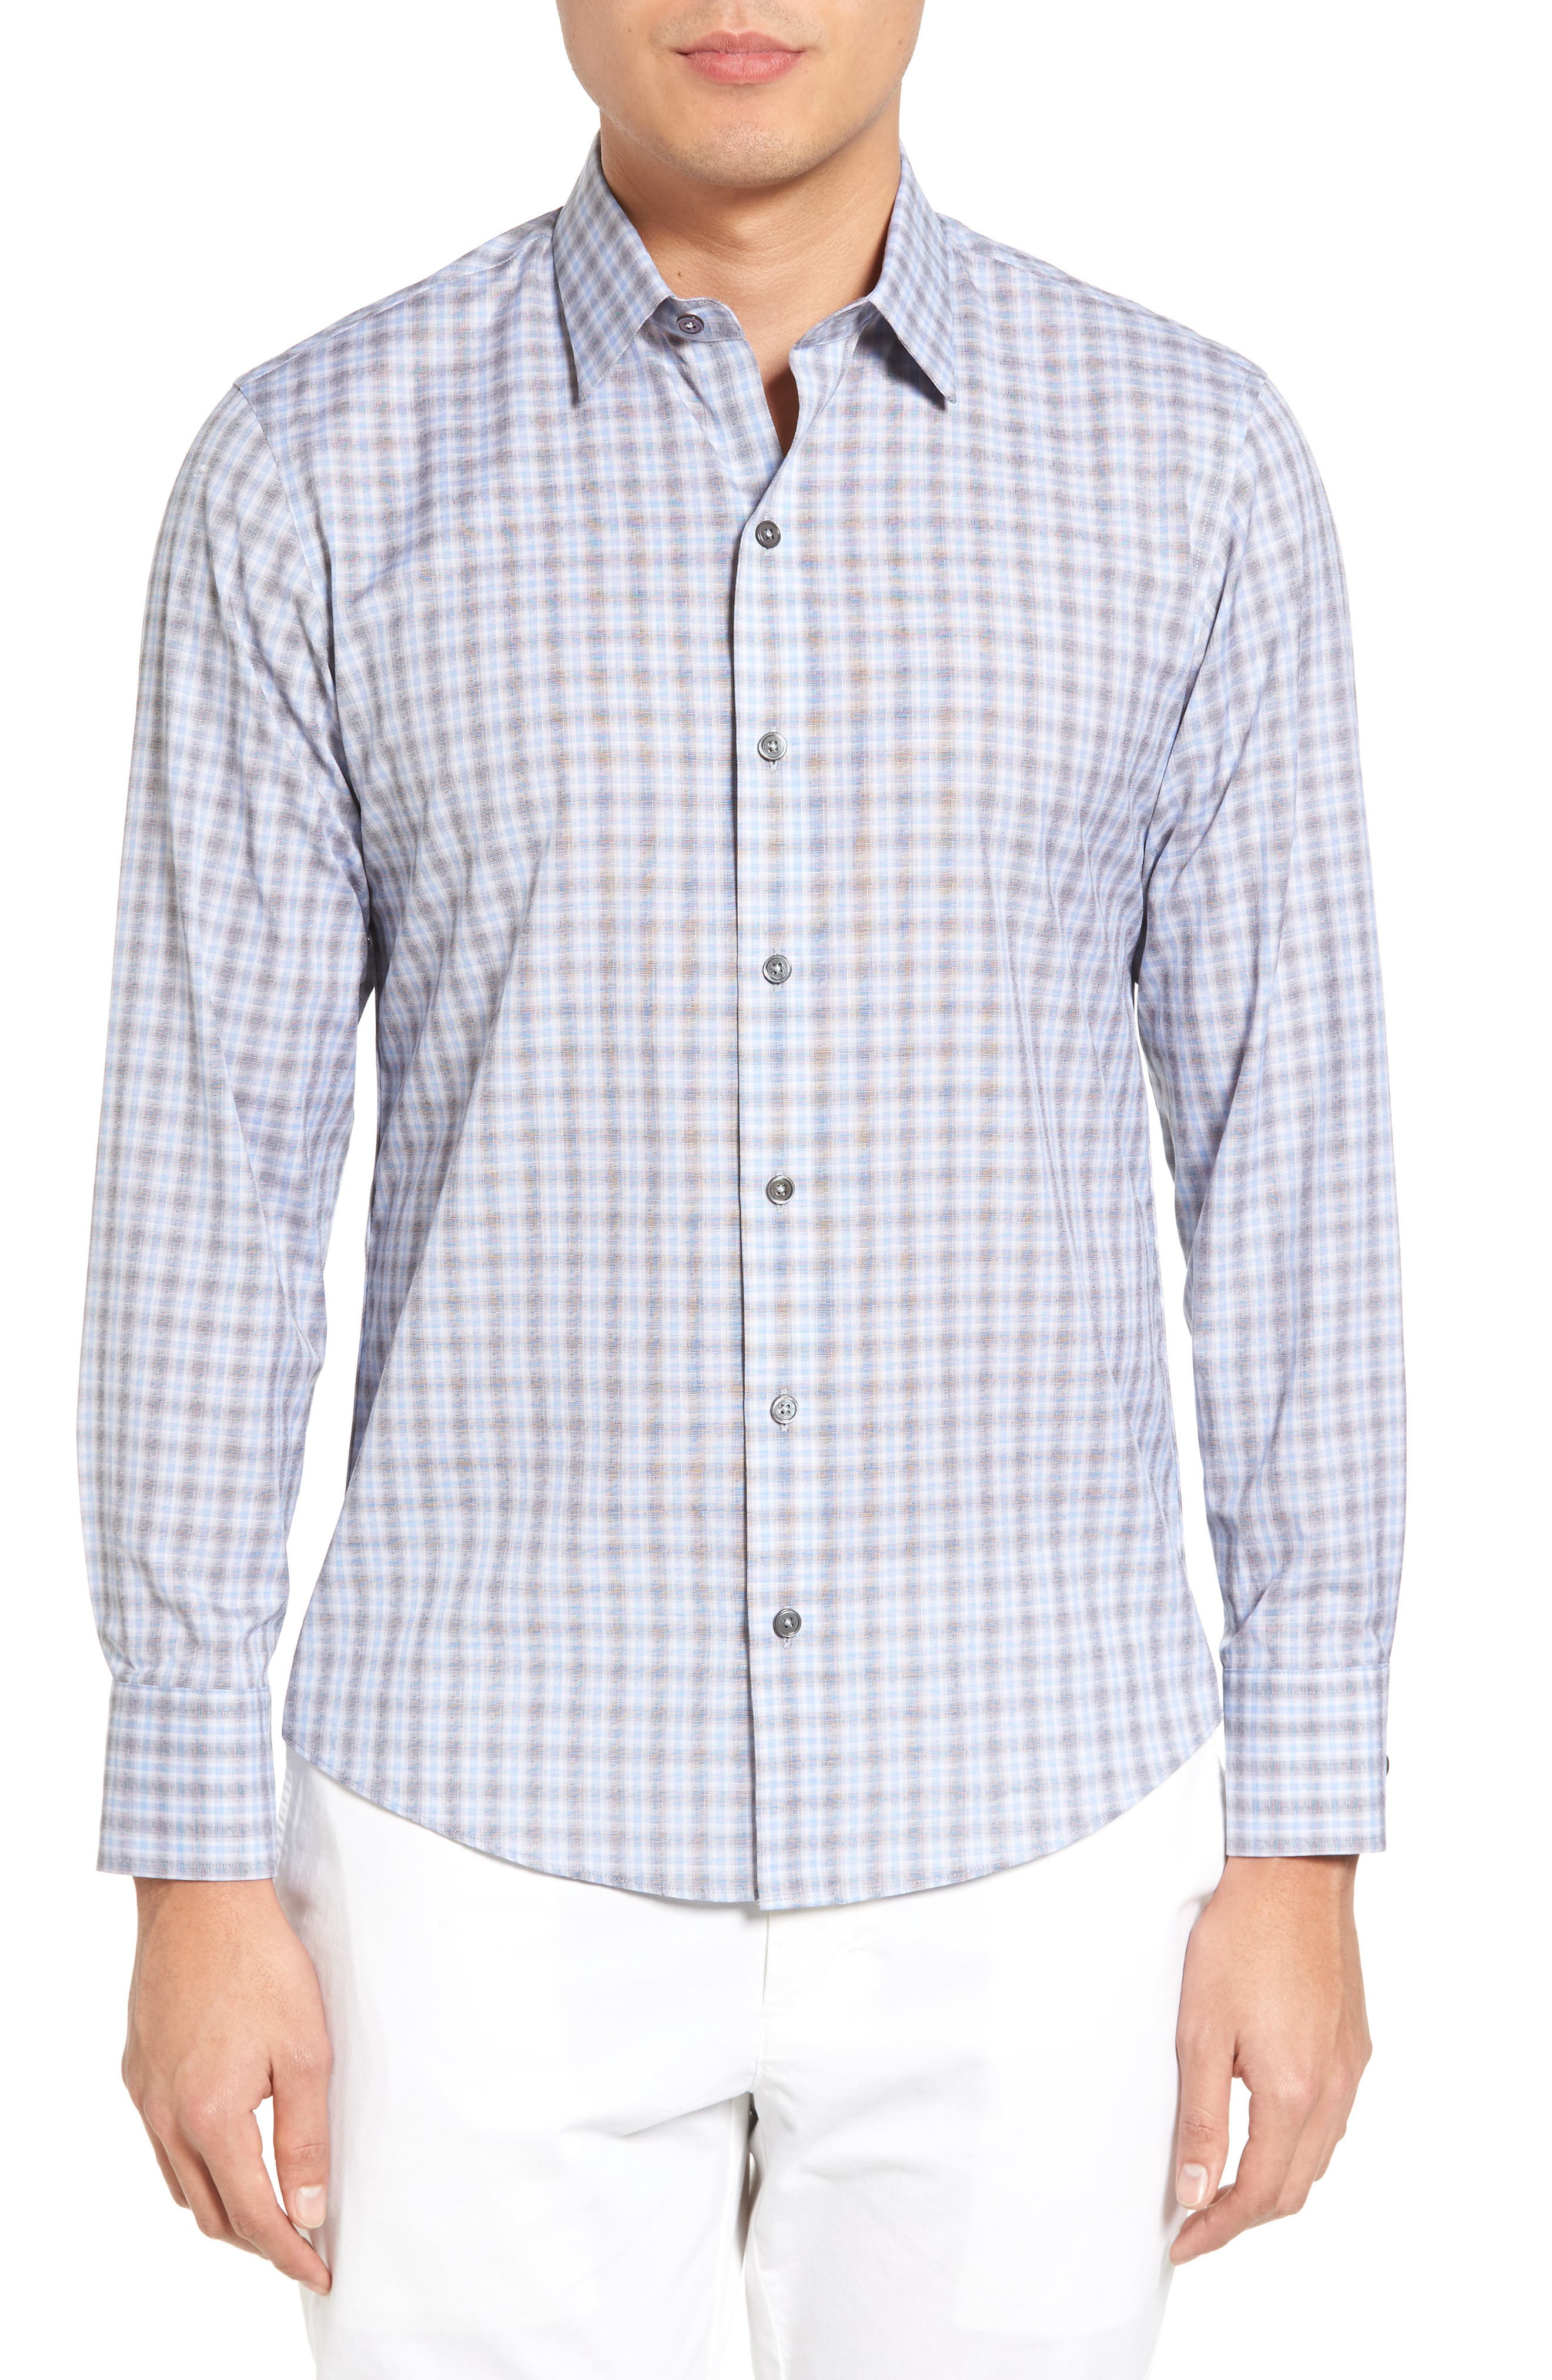 Cristiano Trim Fit Plaid Sport Shirt,                         Main,                         color, 020